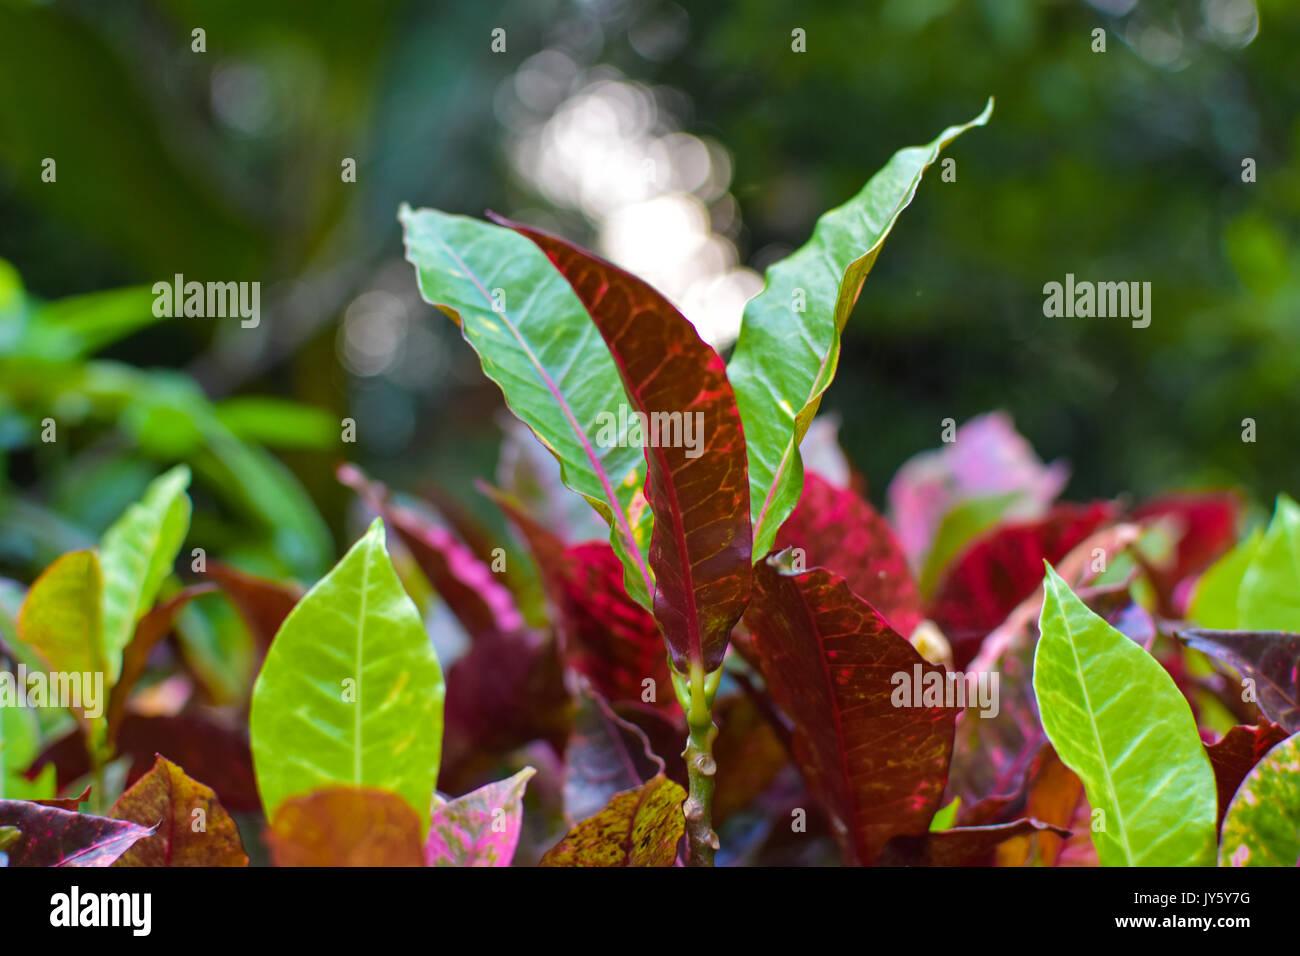 Pianta Foglie Rosse E Verdi verde giallo foglie rosse croton pianta - giardino le foglie